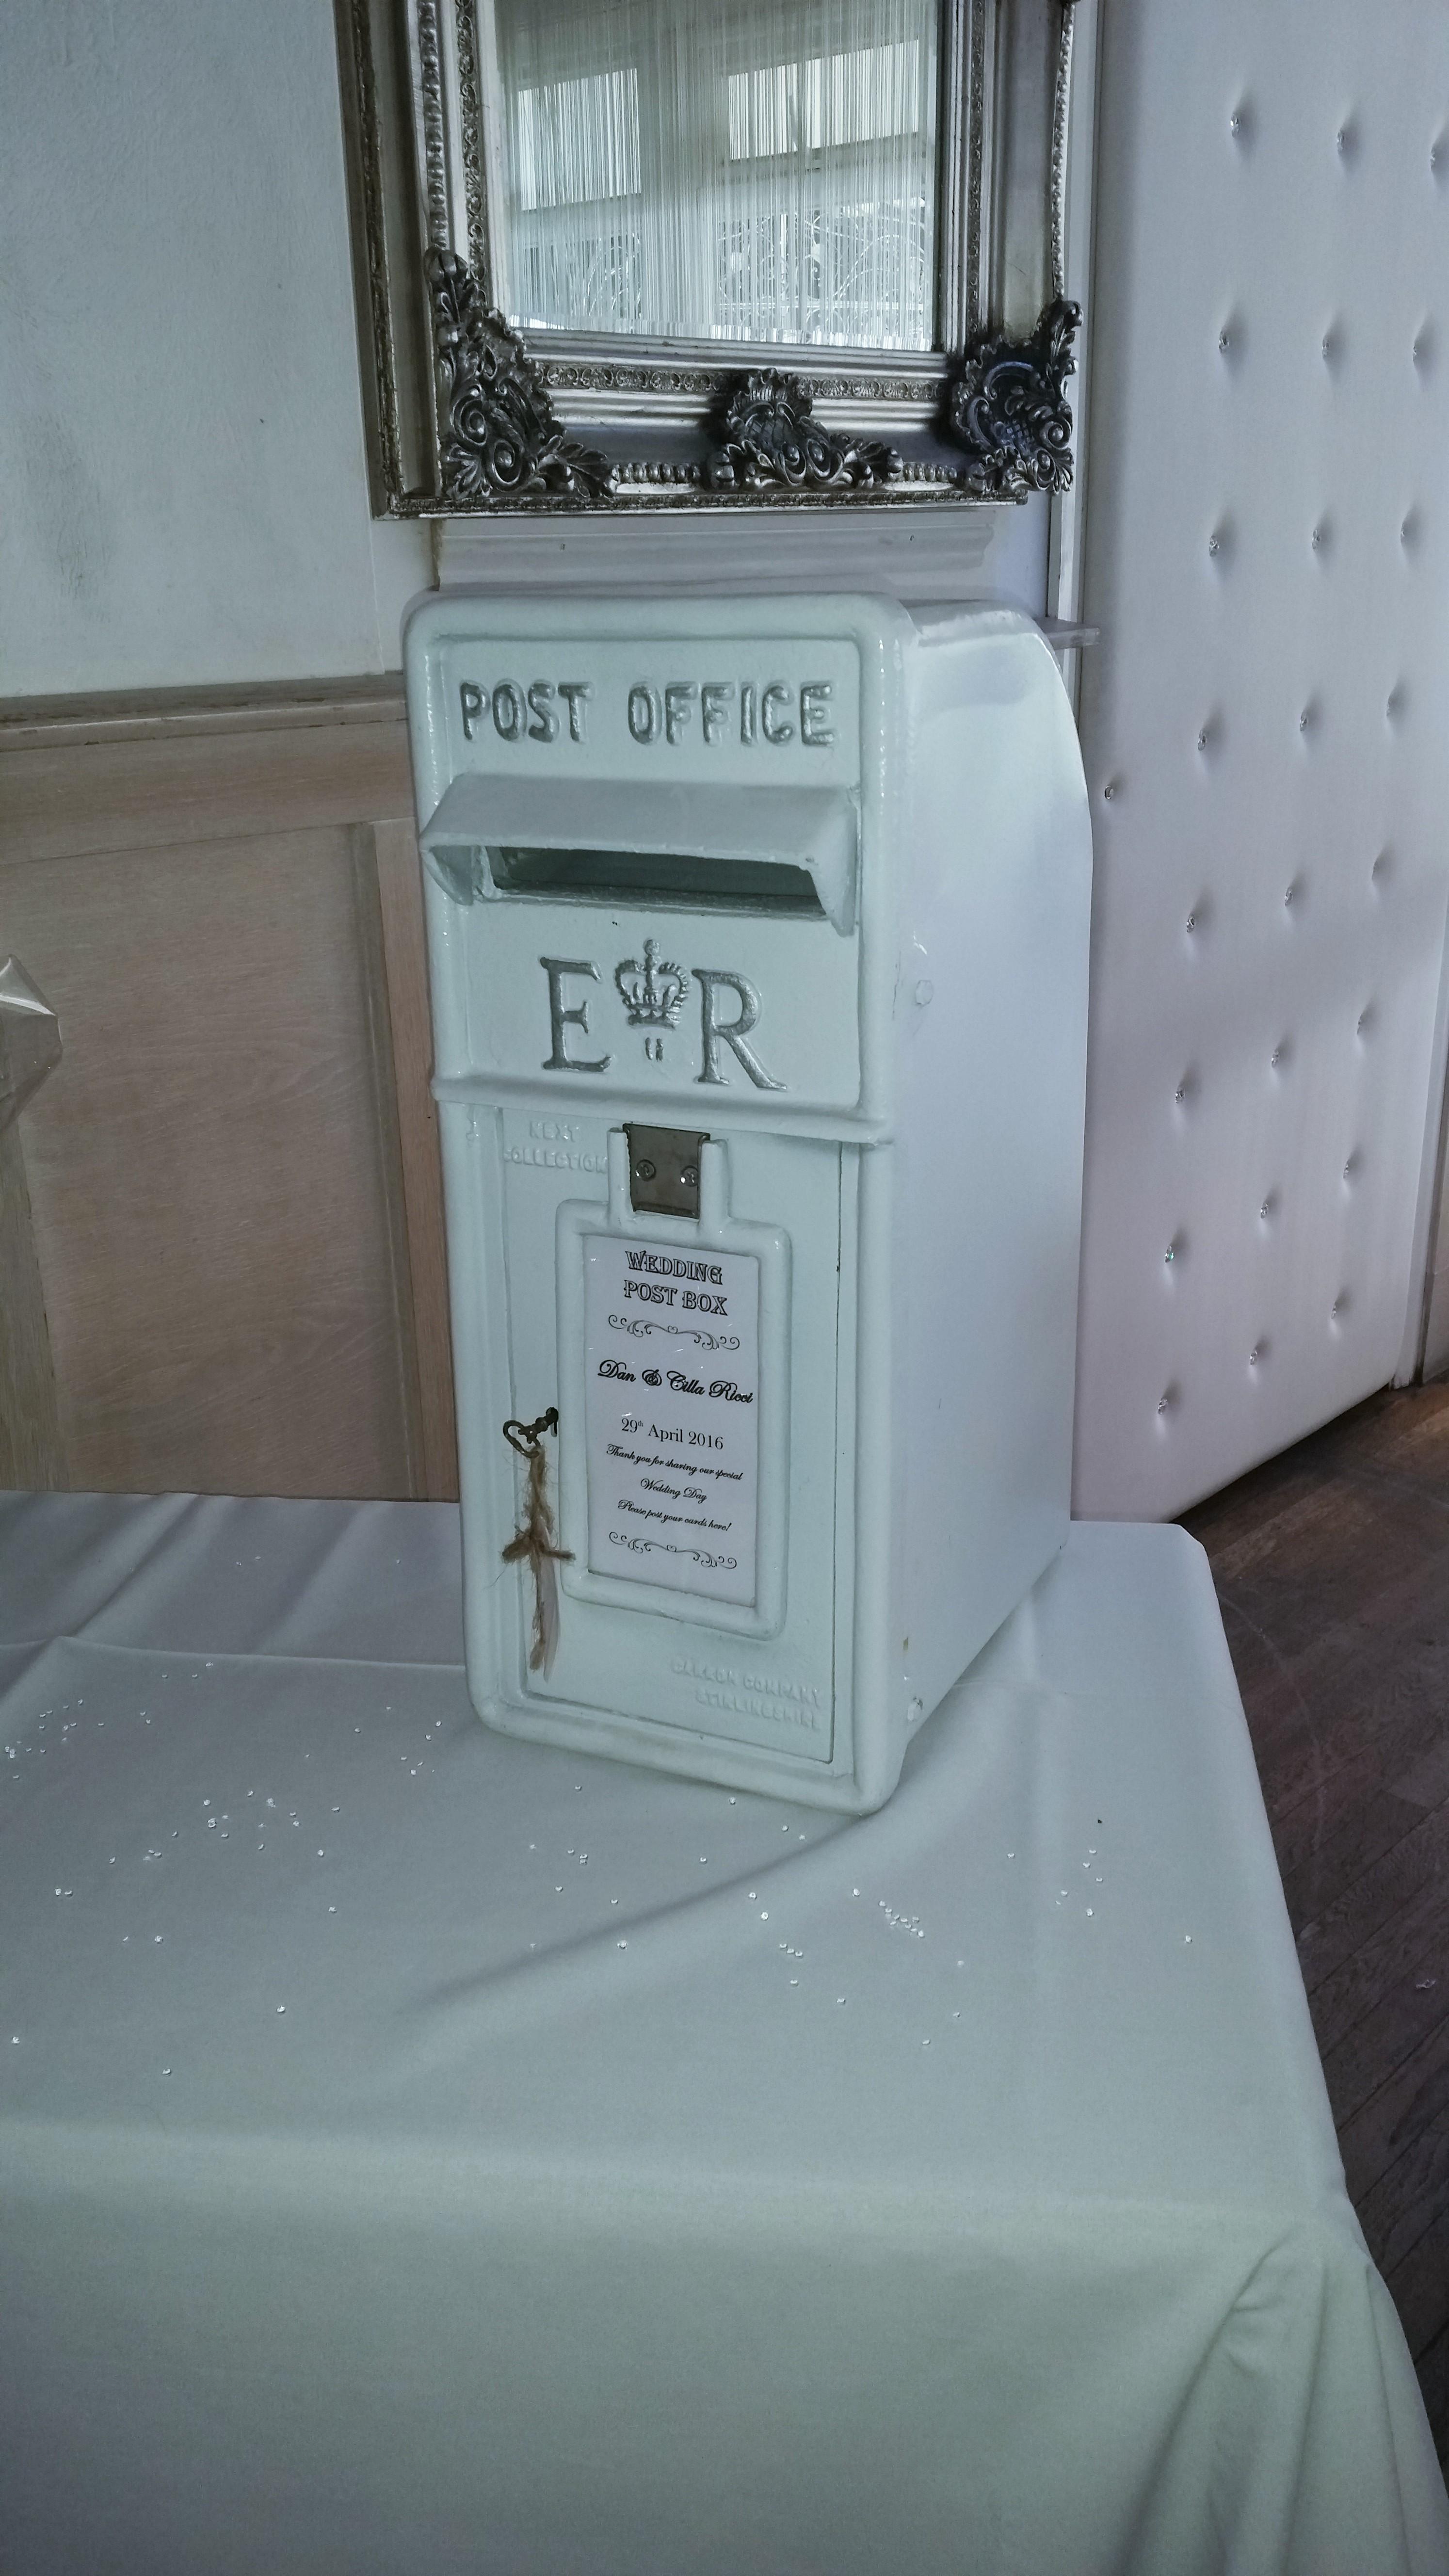 Royal Mail Post Box Hire Stevenage